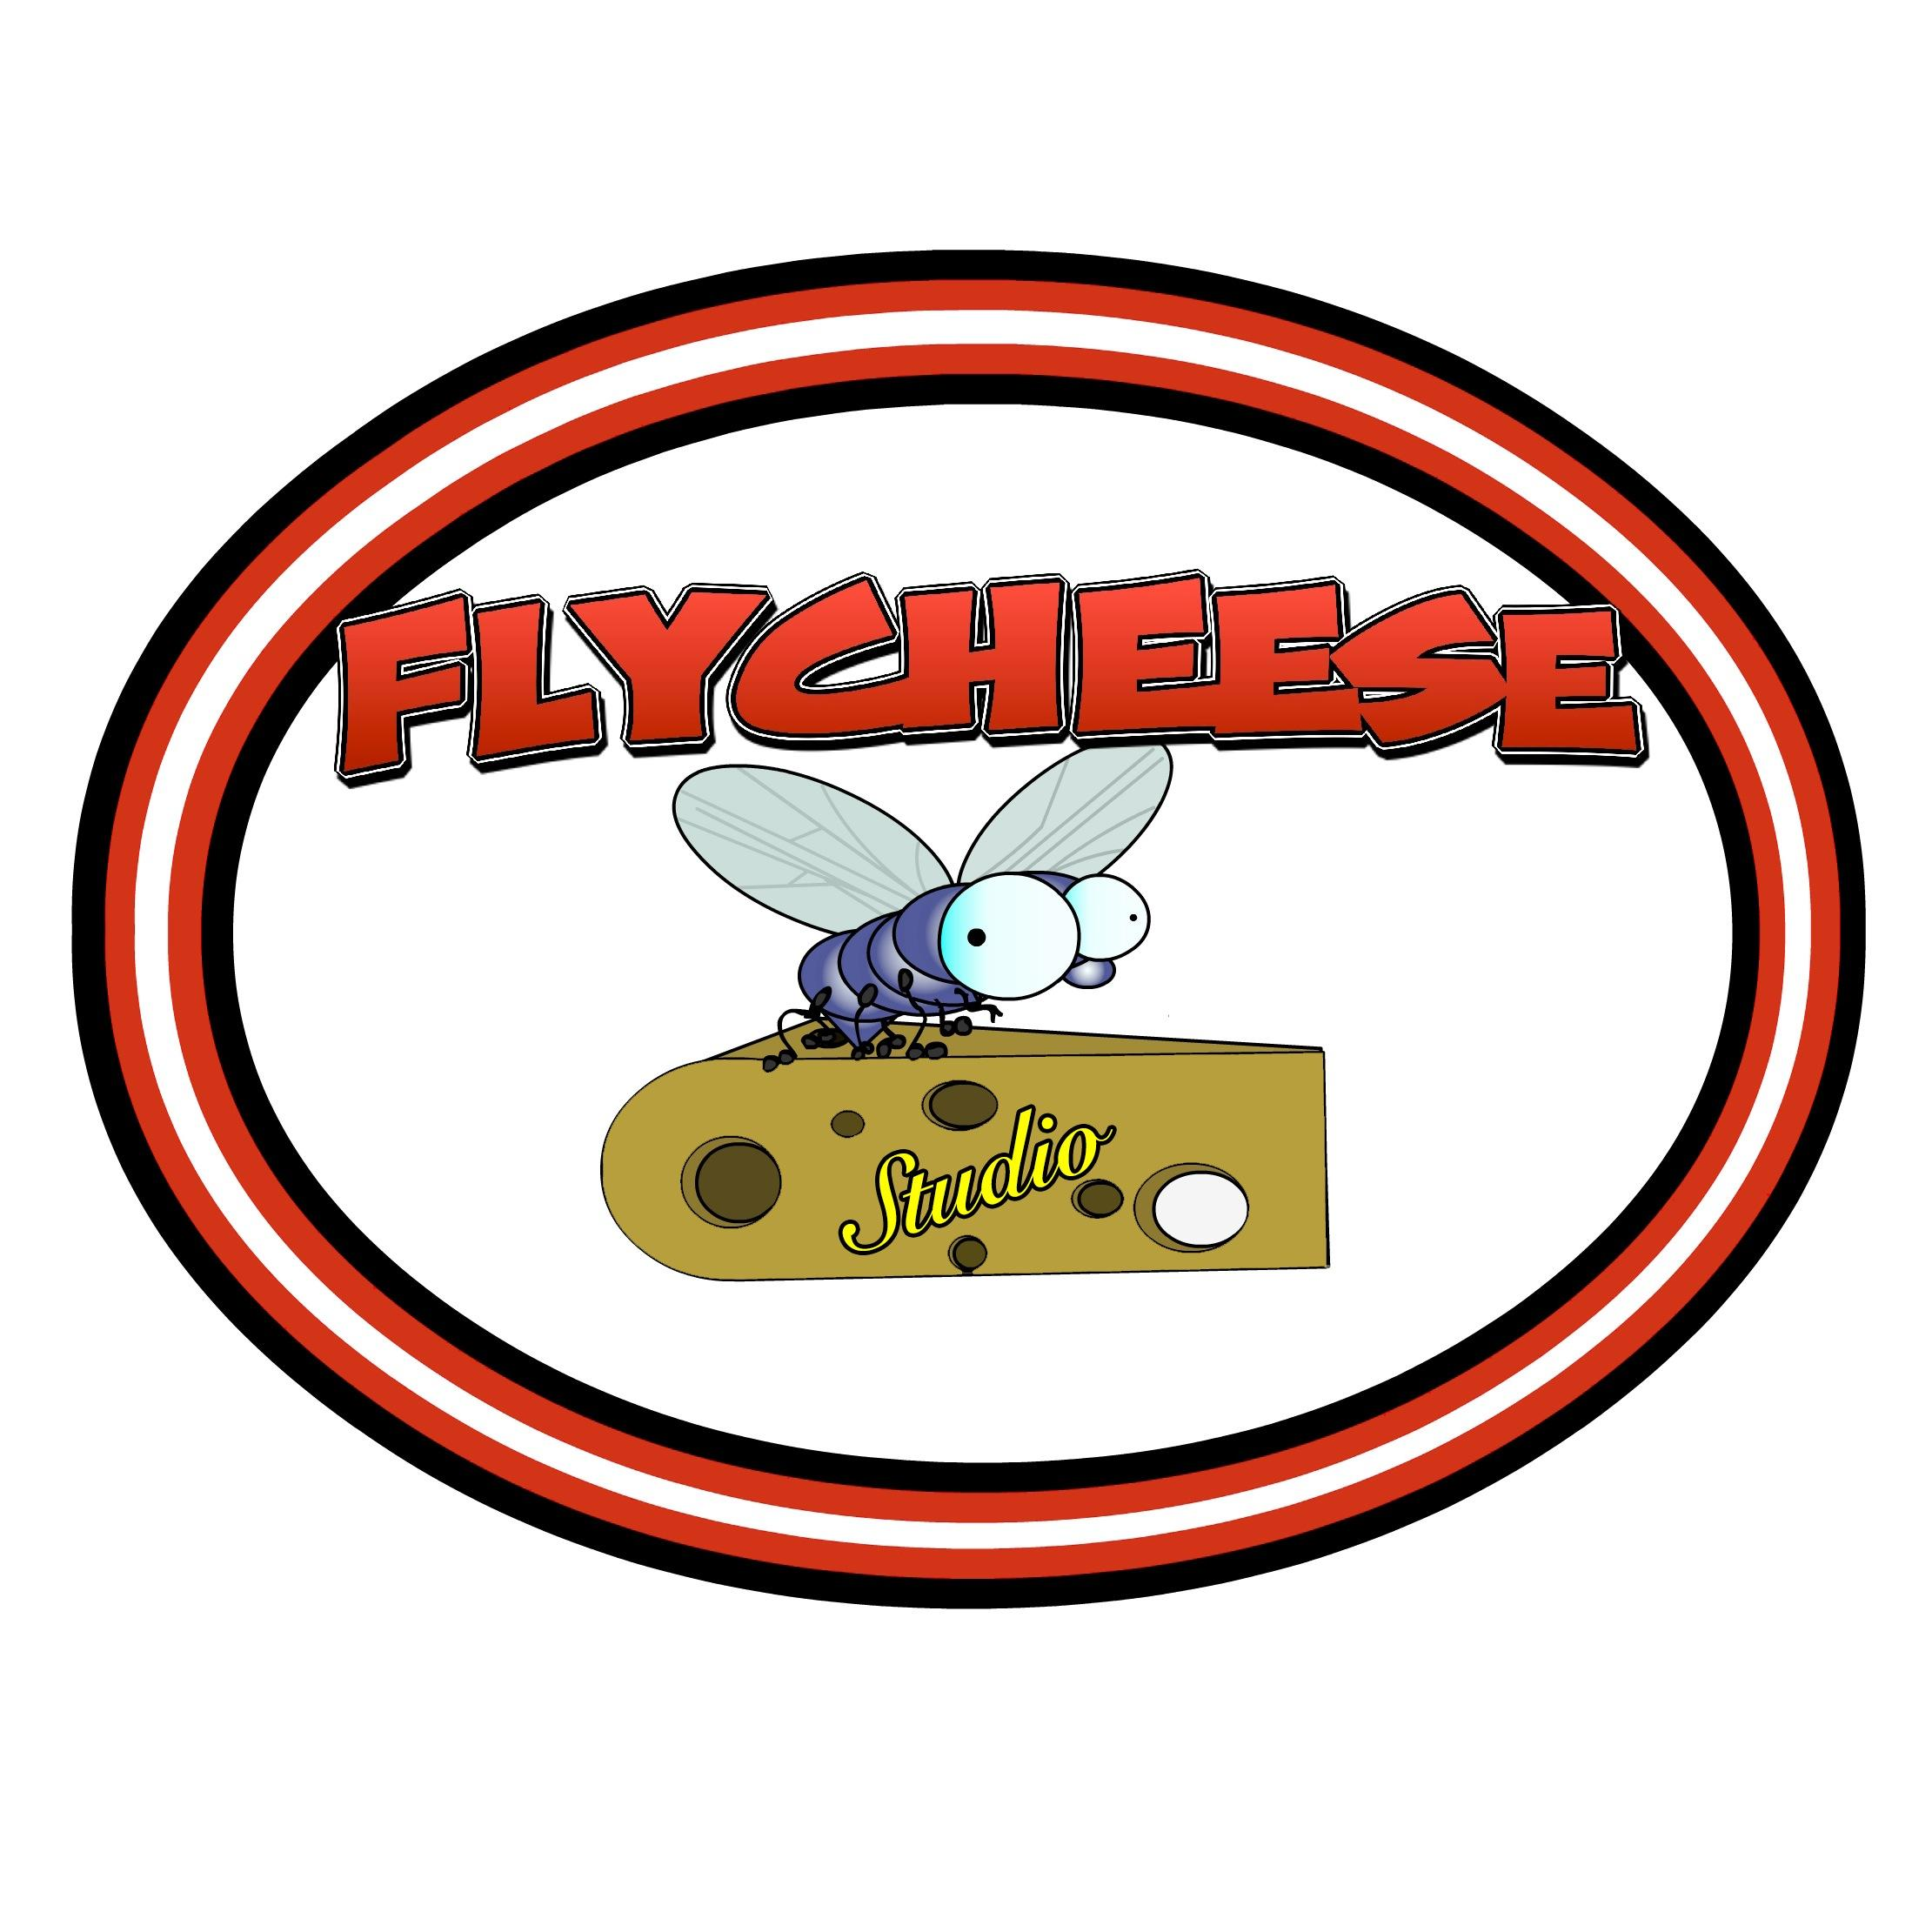 Flycheese Studio